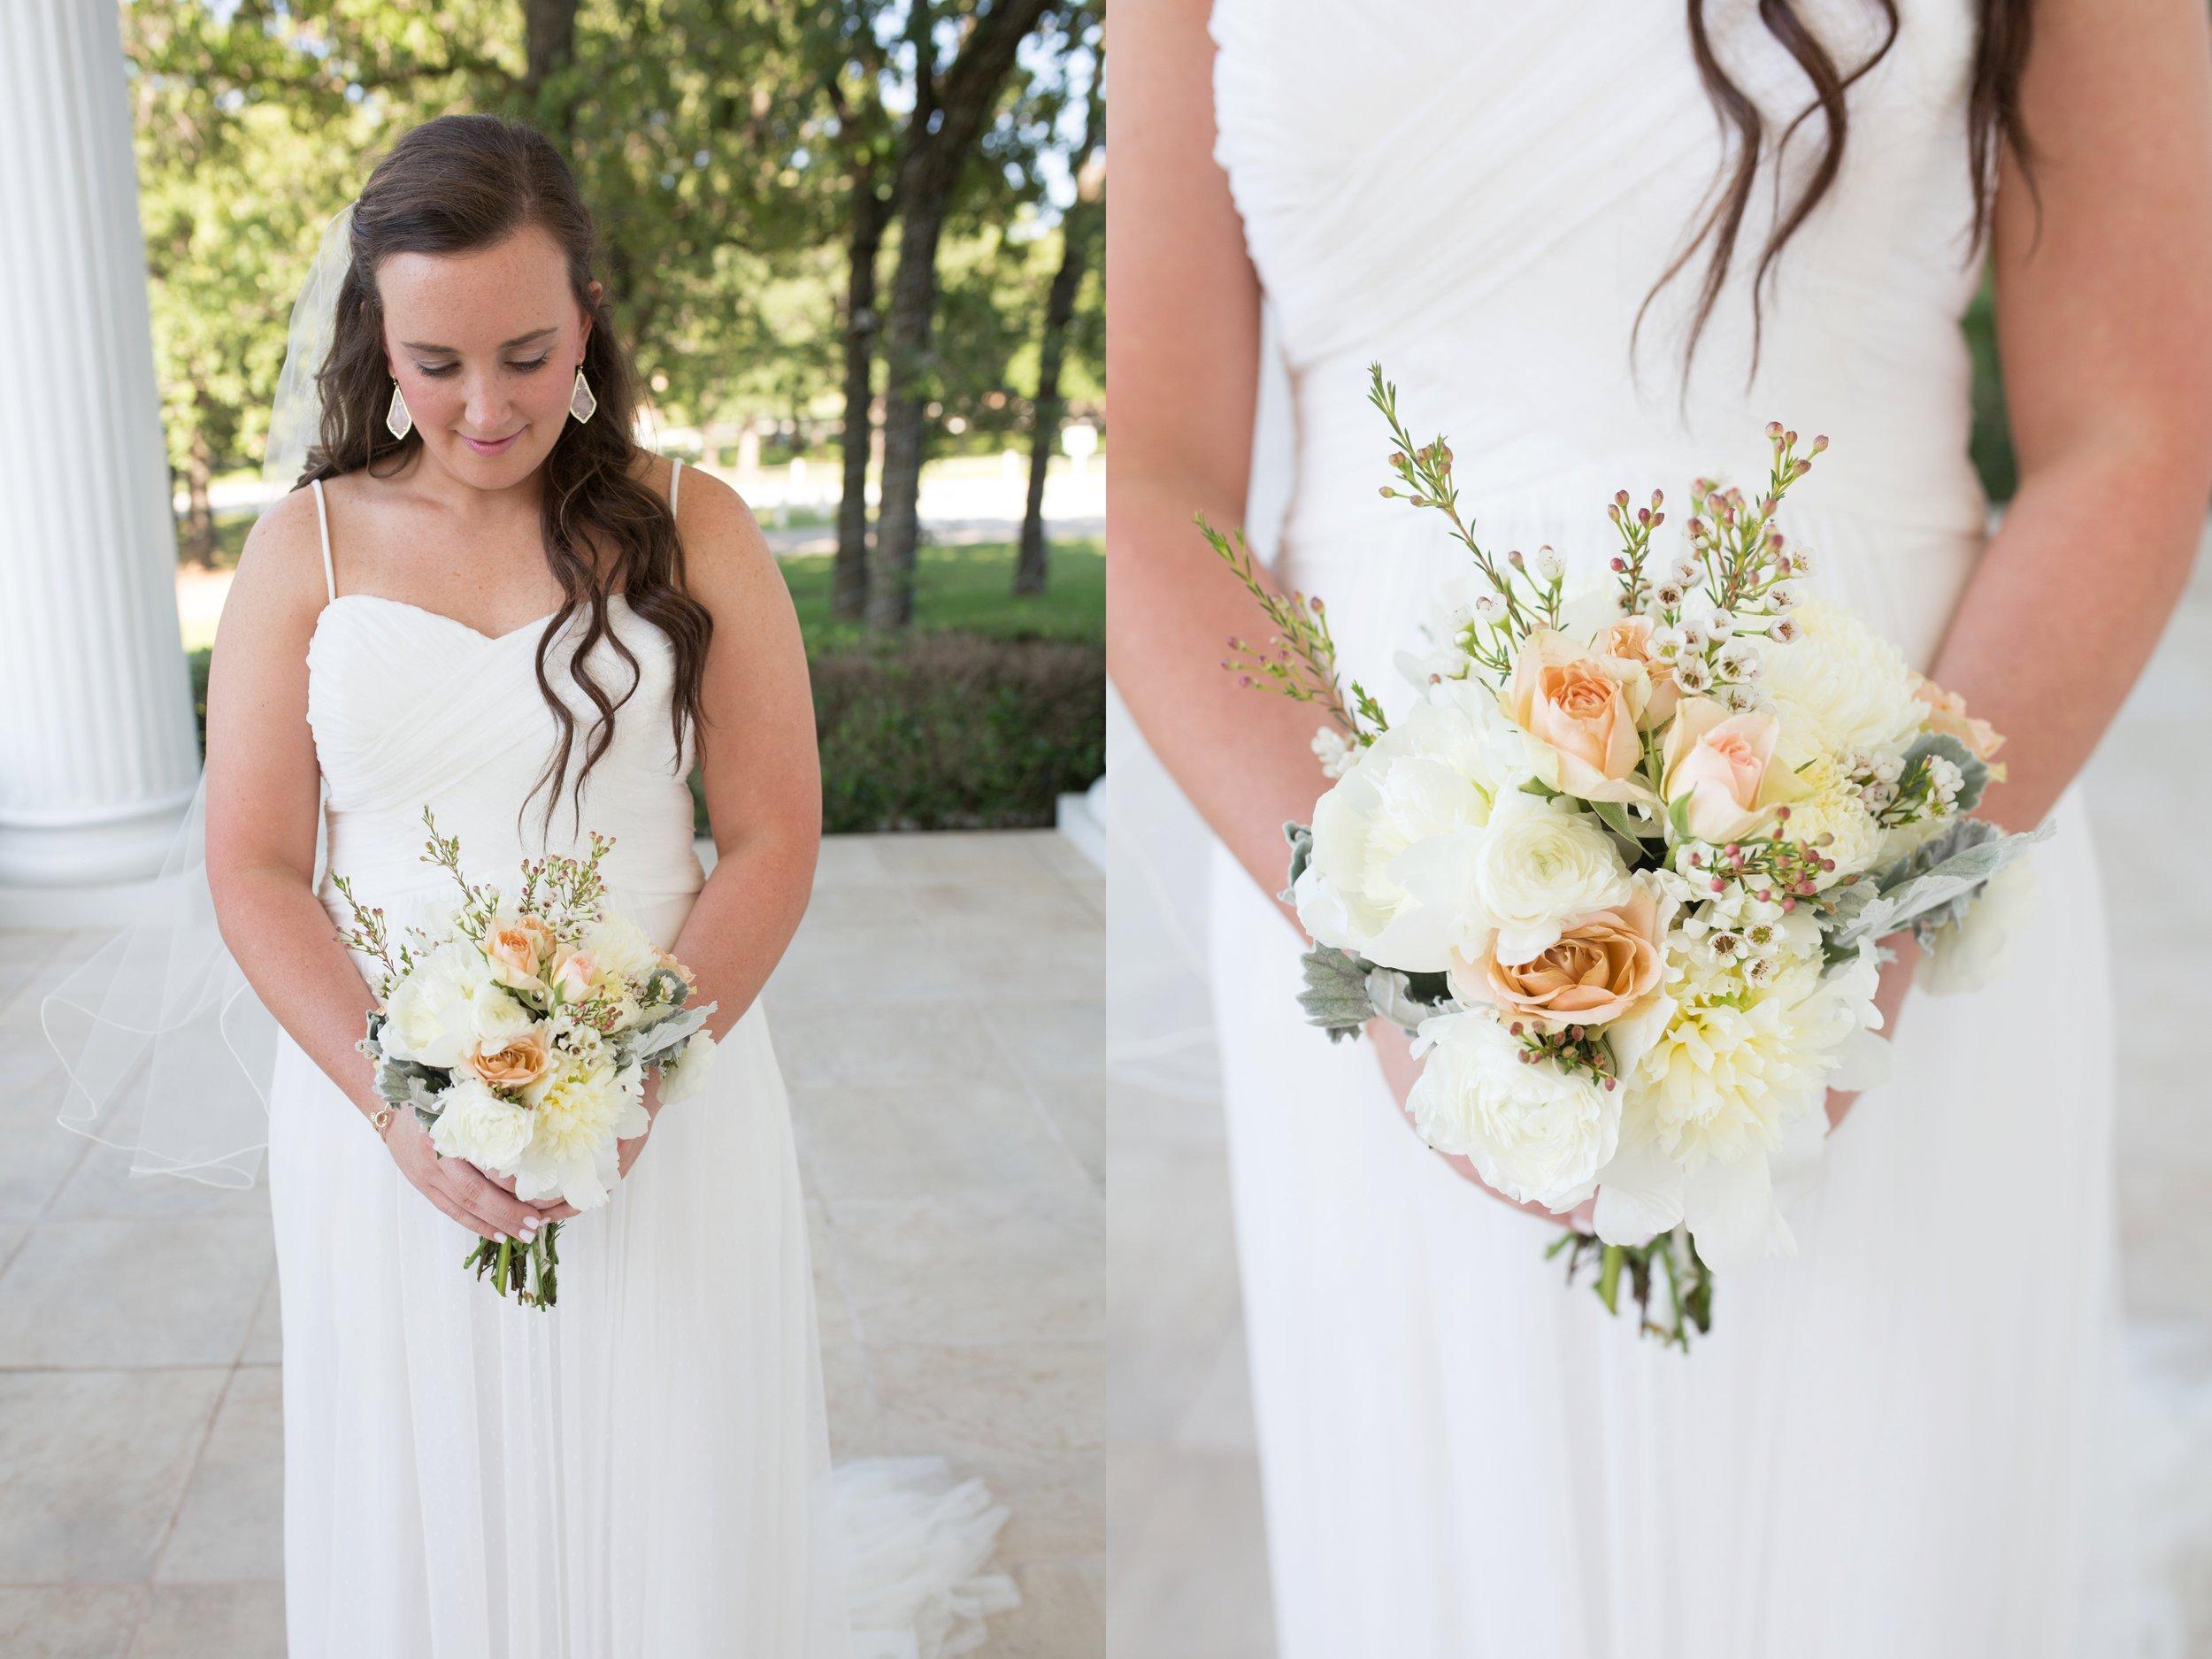 Lonestar-Mansion-Fort-Worth-Wedding-Planner-Burleson-Wedding-Venue_39.jpg